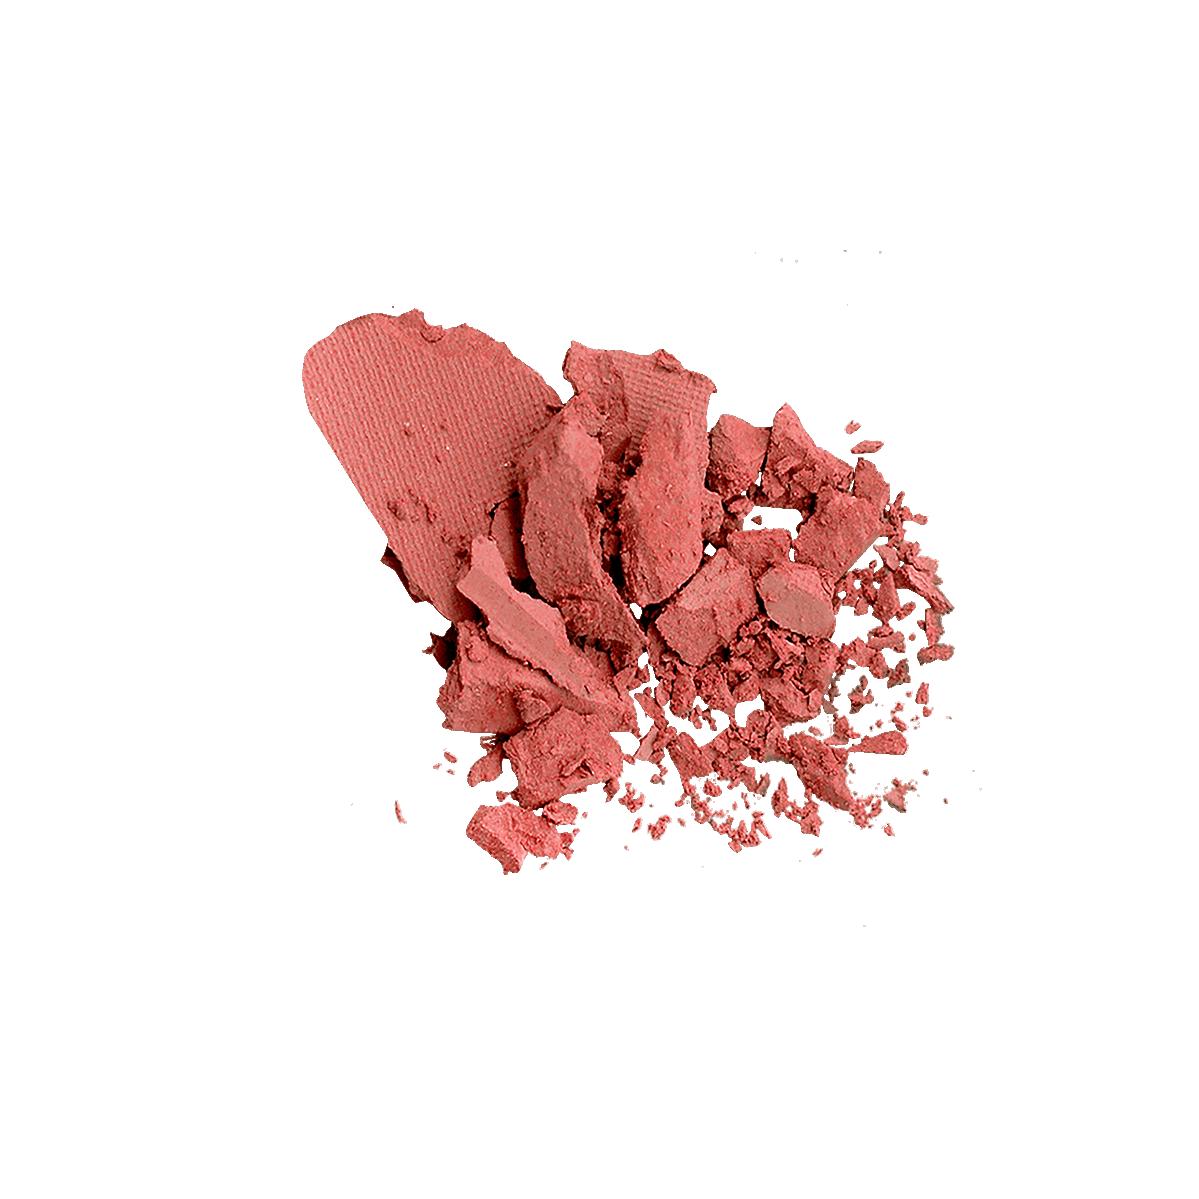 collab-soft-spot-sheer-blush-shade-meetcute.png